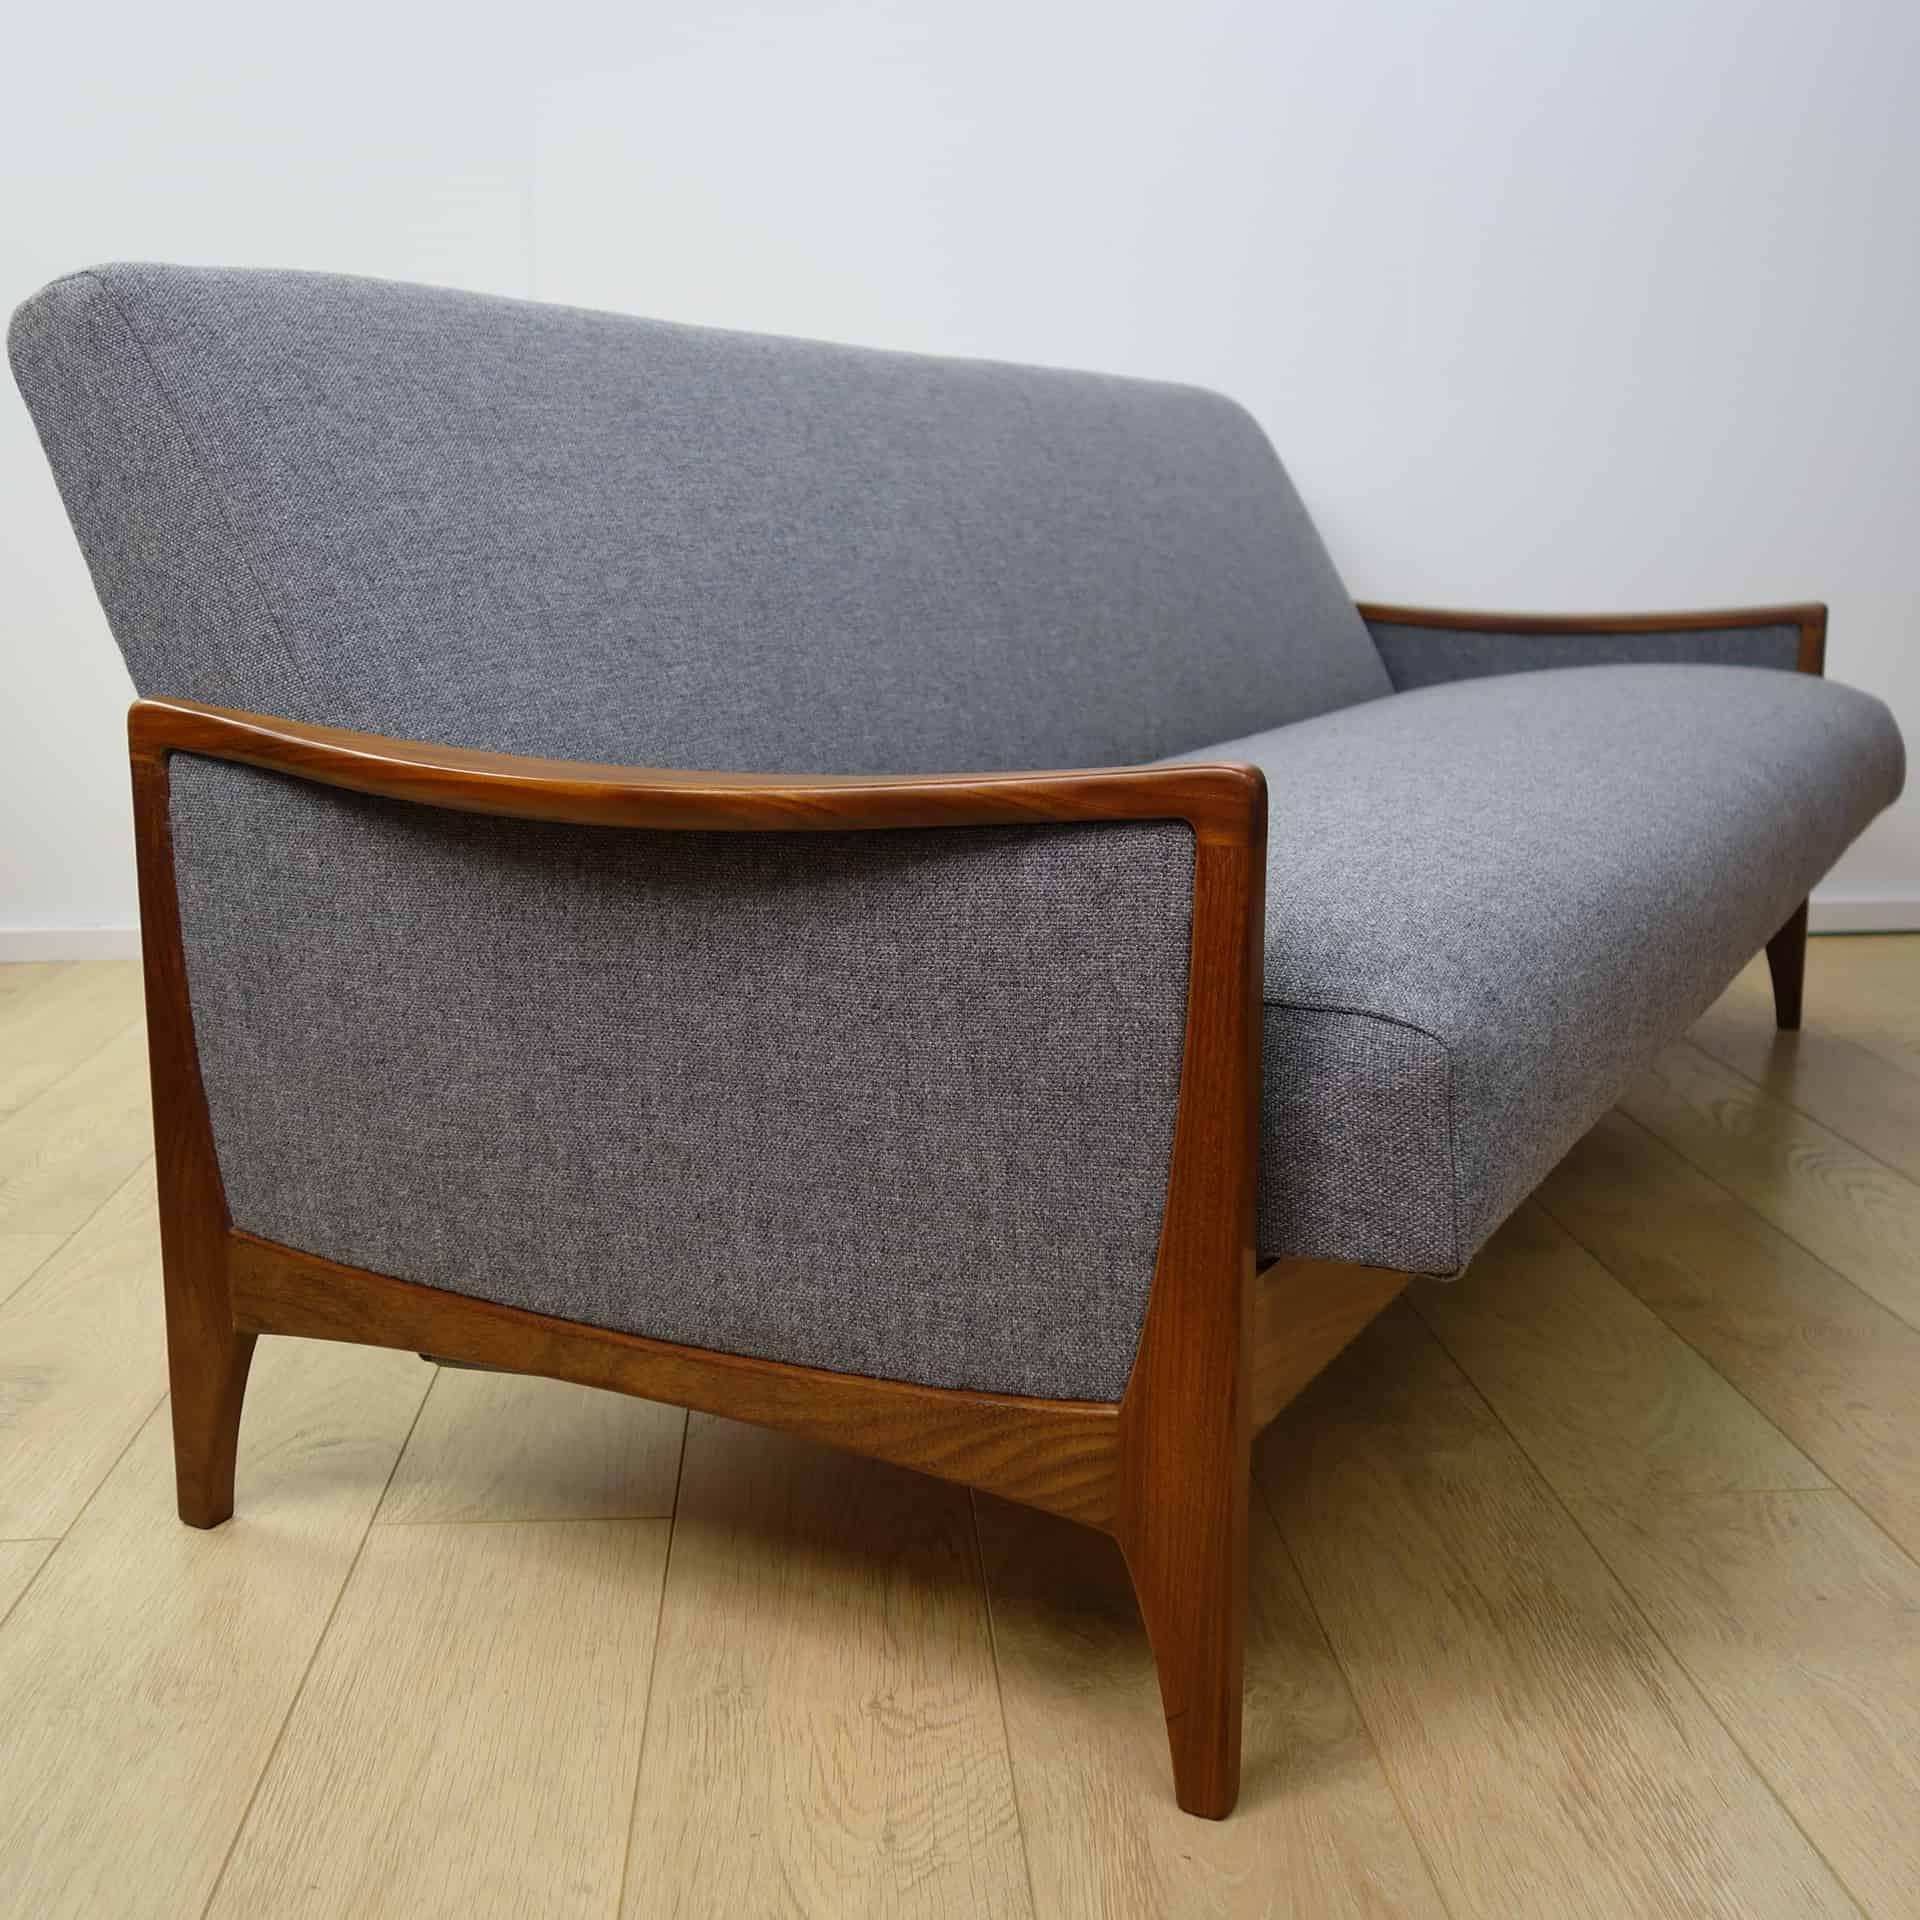 g plan sofa 1960s teak